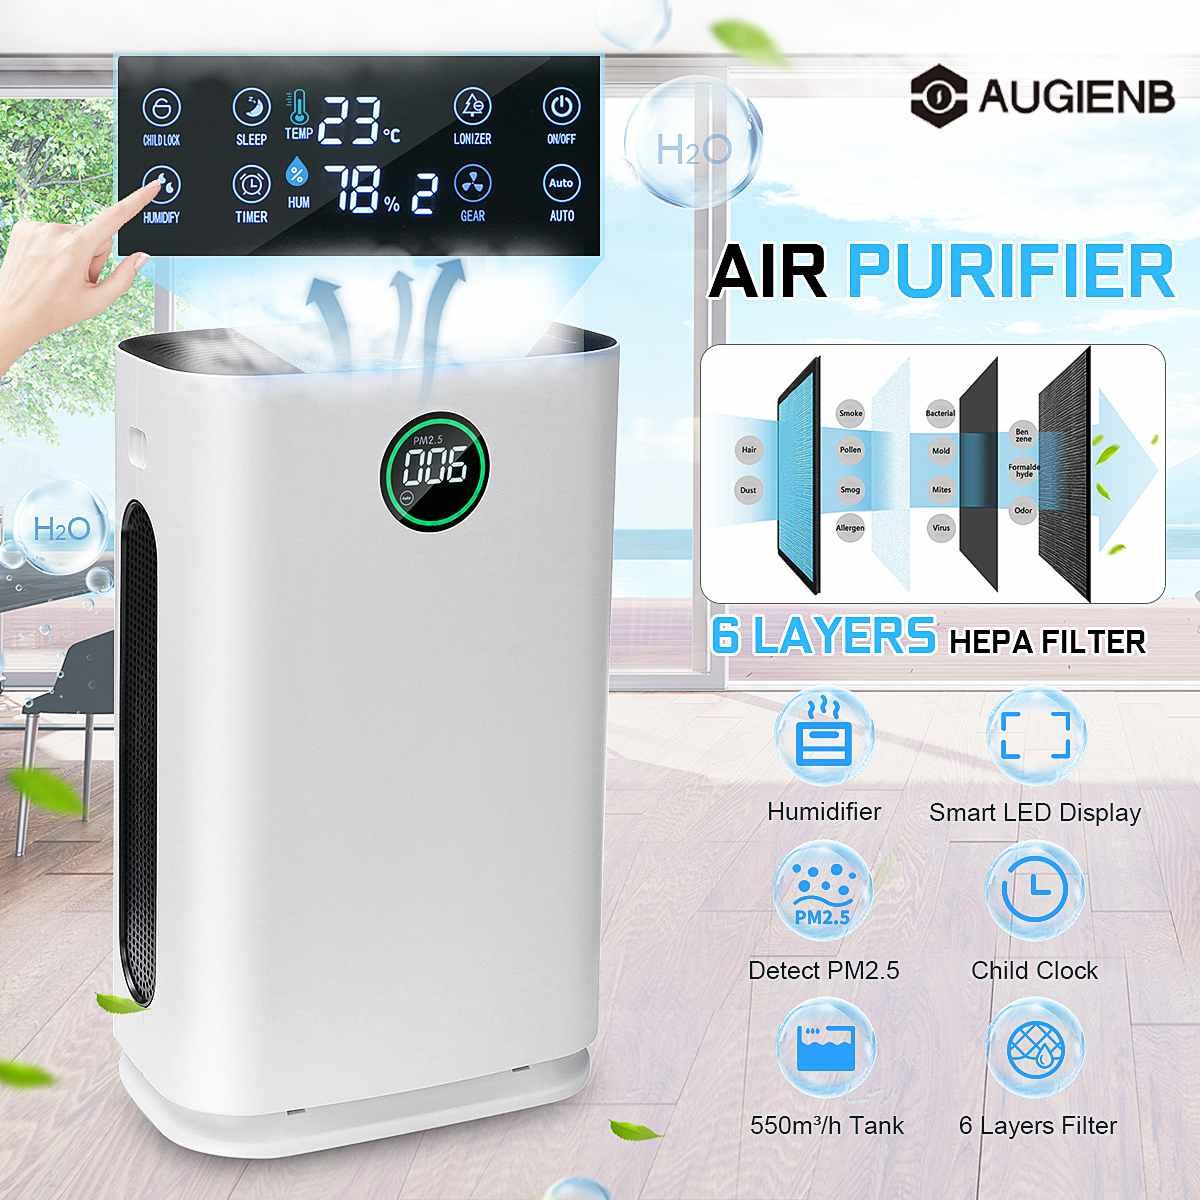 "AUGIENB 17"" Large Room Air Purifier for Home, True HEPA Filter, Odor Allergies Remover for Smoke, Dust, VOCs, Pollen, Pet Dander"